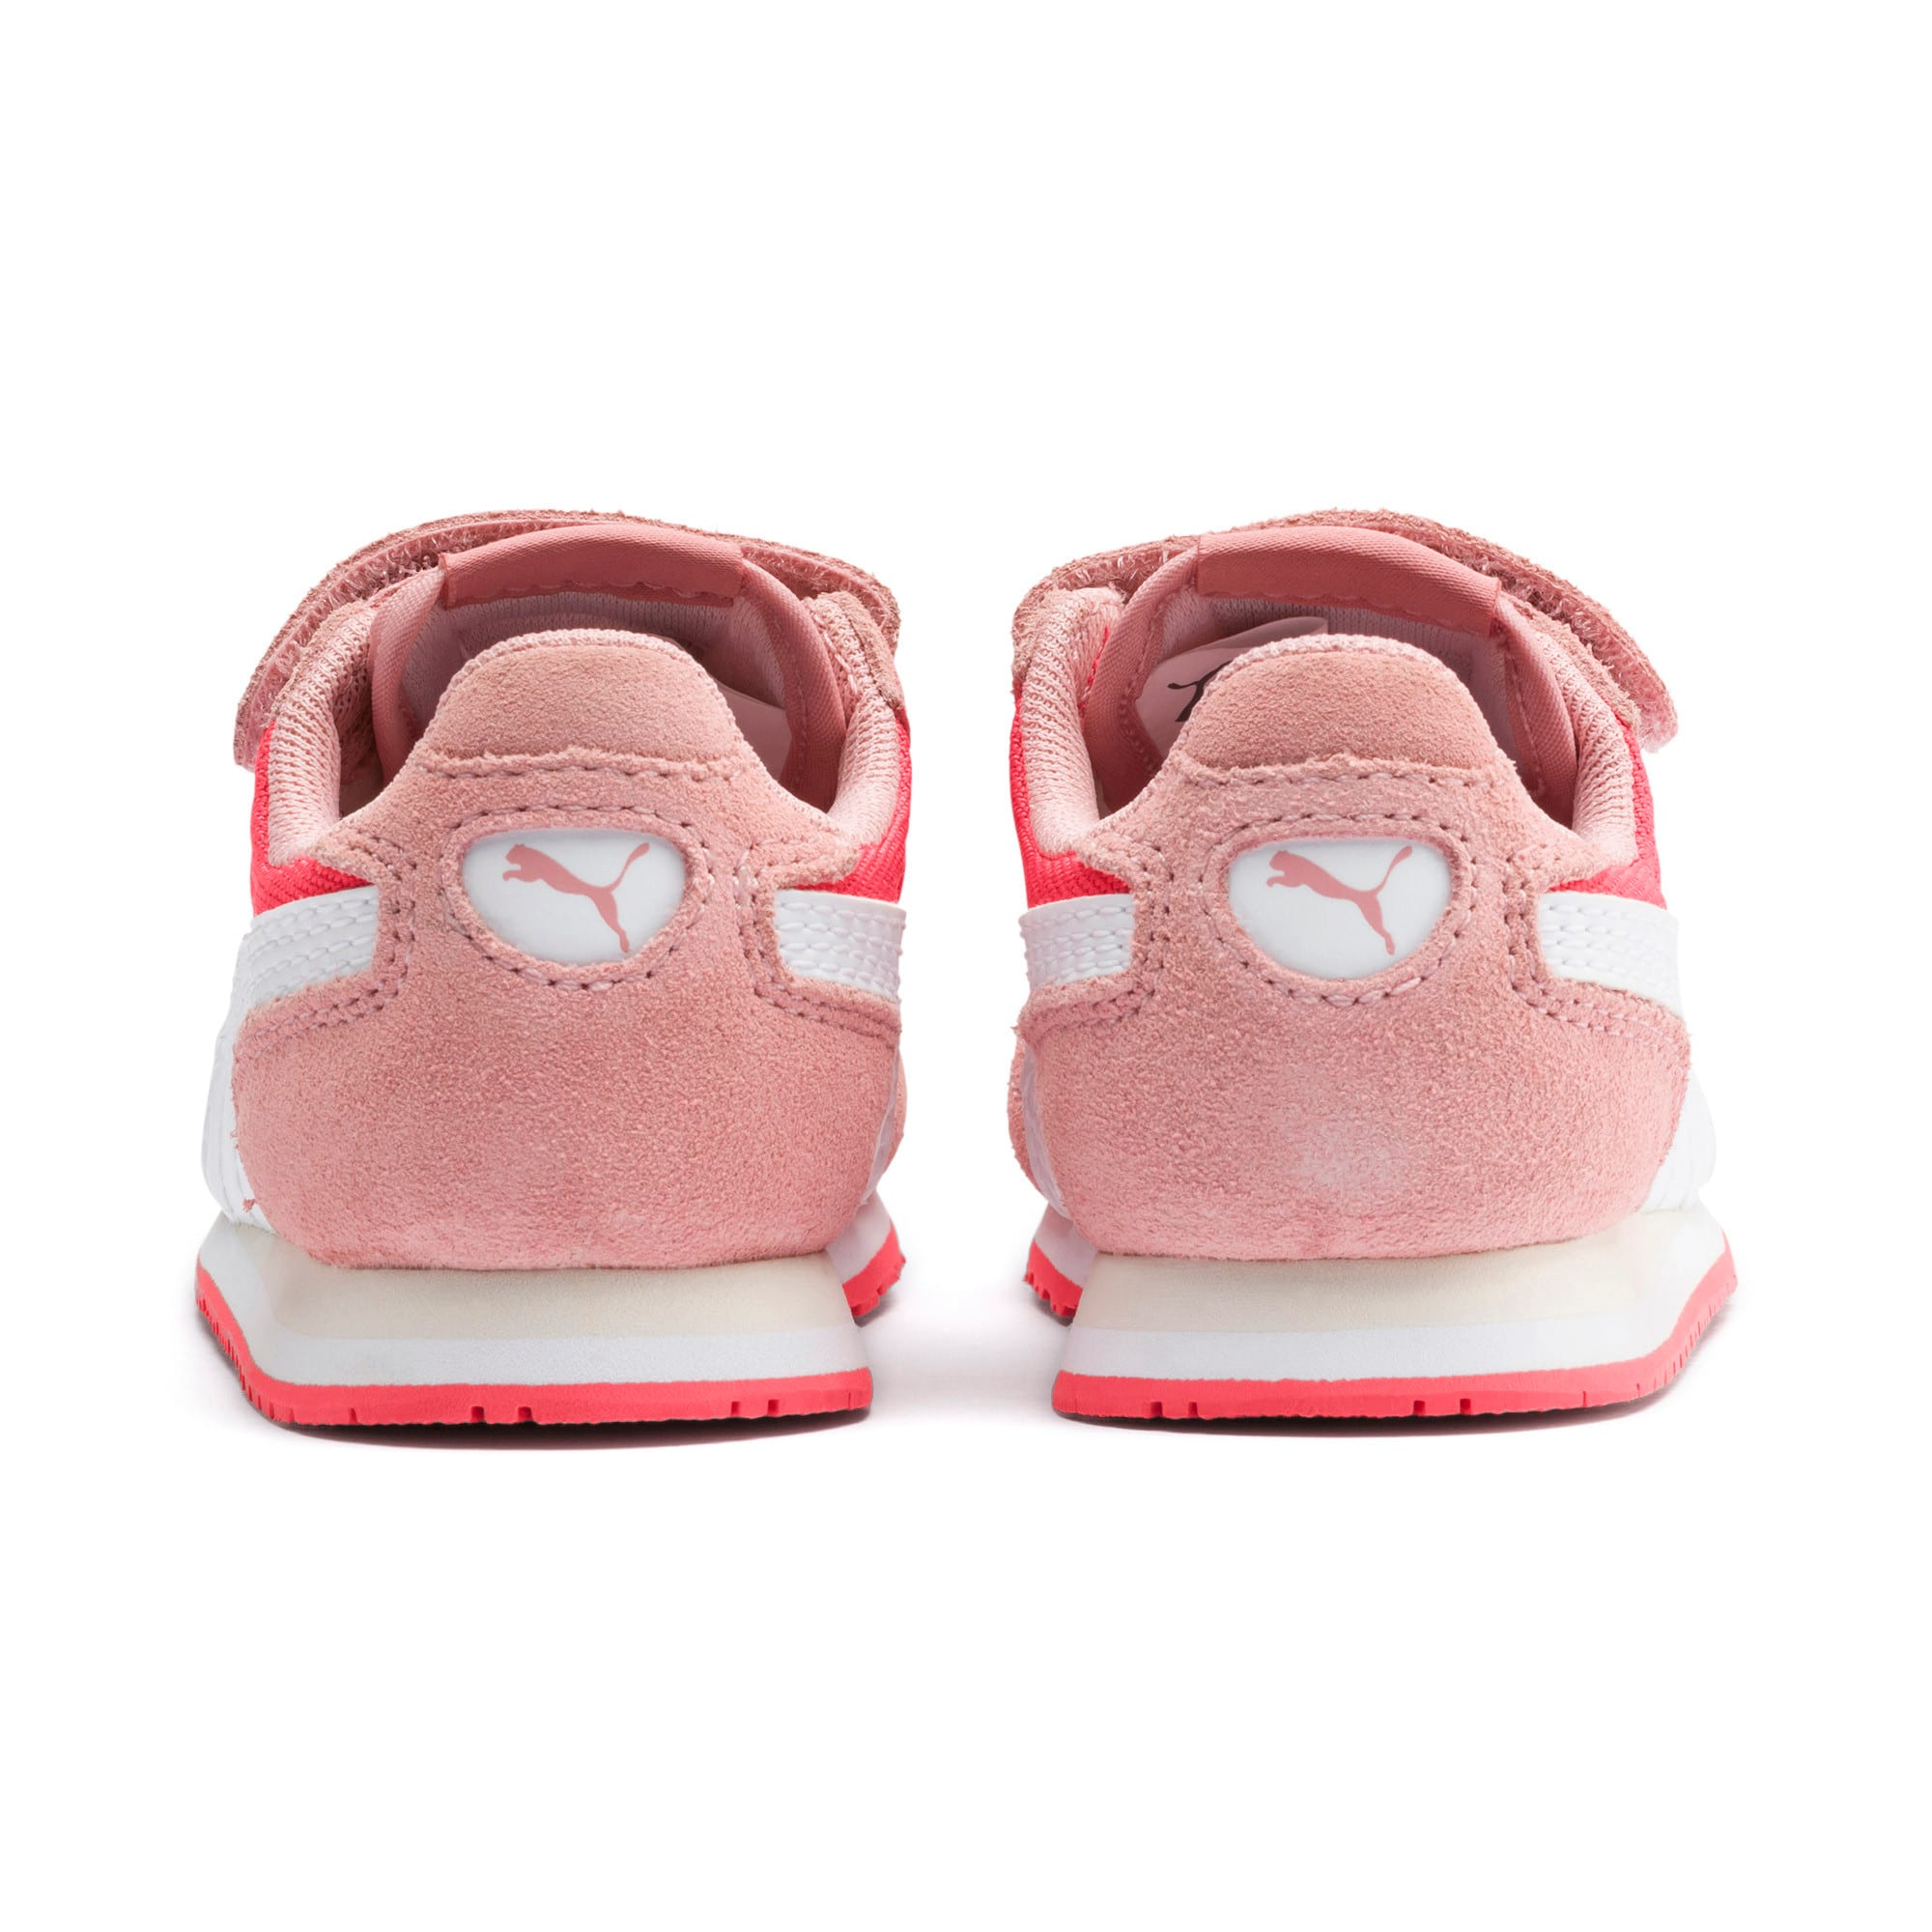 Thumbnail 3 of Cabana Racer Toddler Shoes, Calypso Coral-Bridal Rose, medium